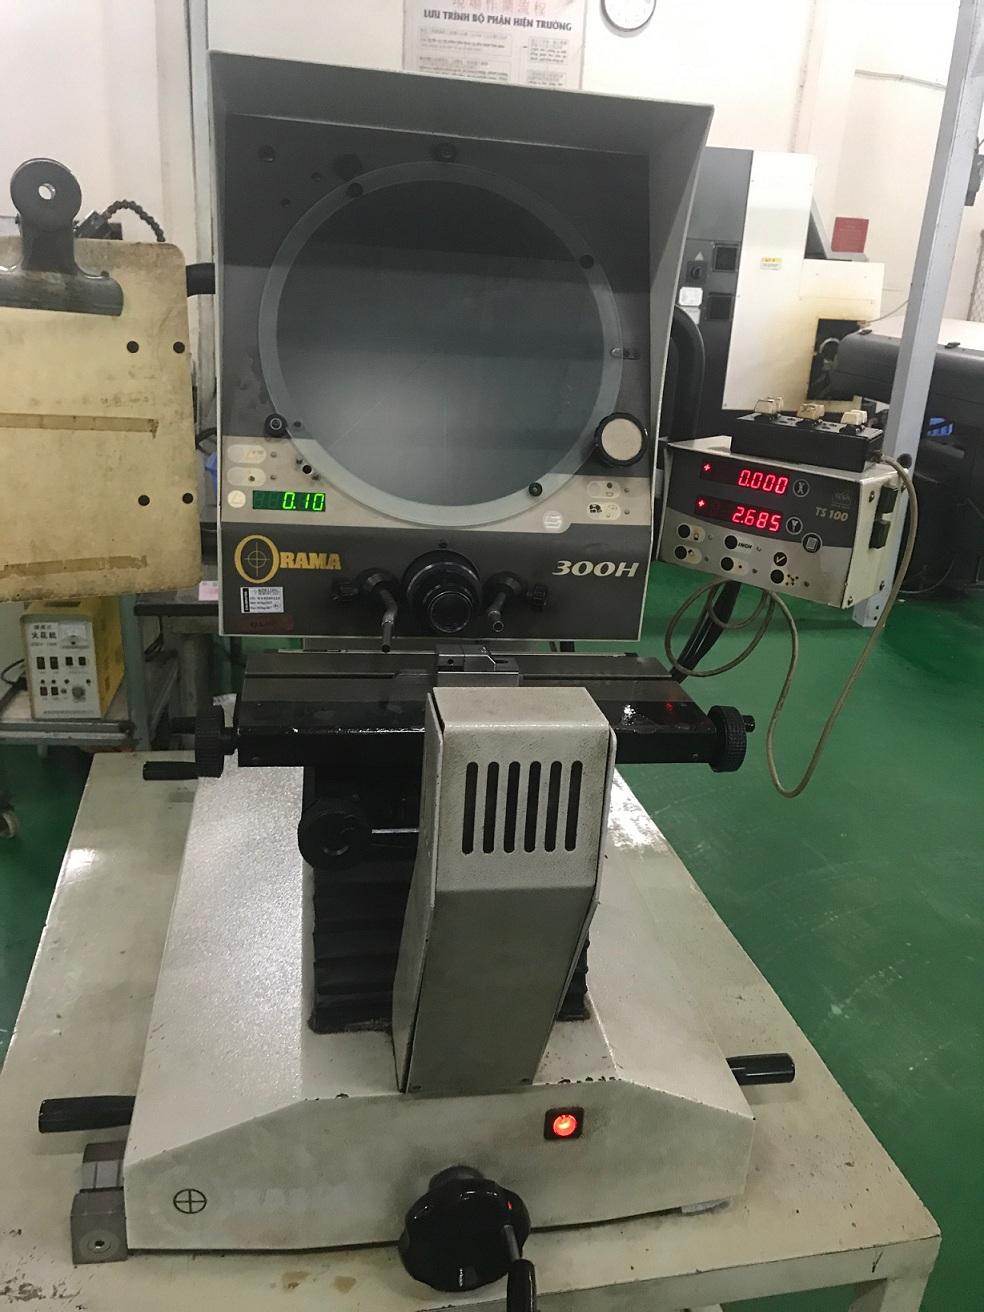 Maintenance Projector Profiles 300H-Maintenace ORAMA